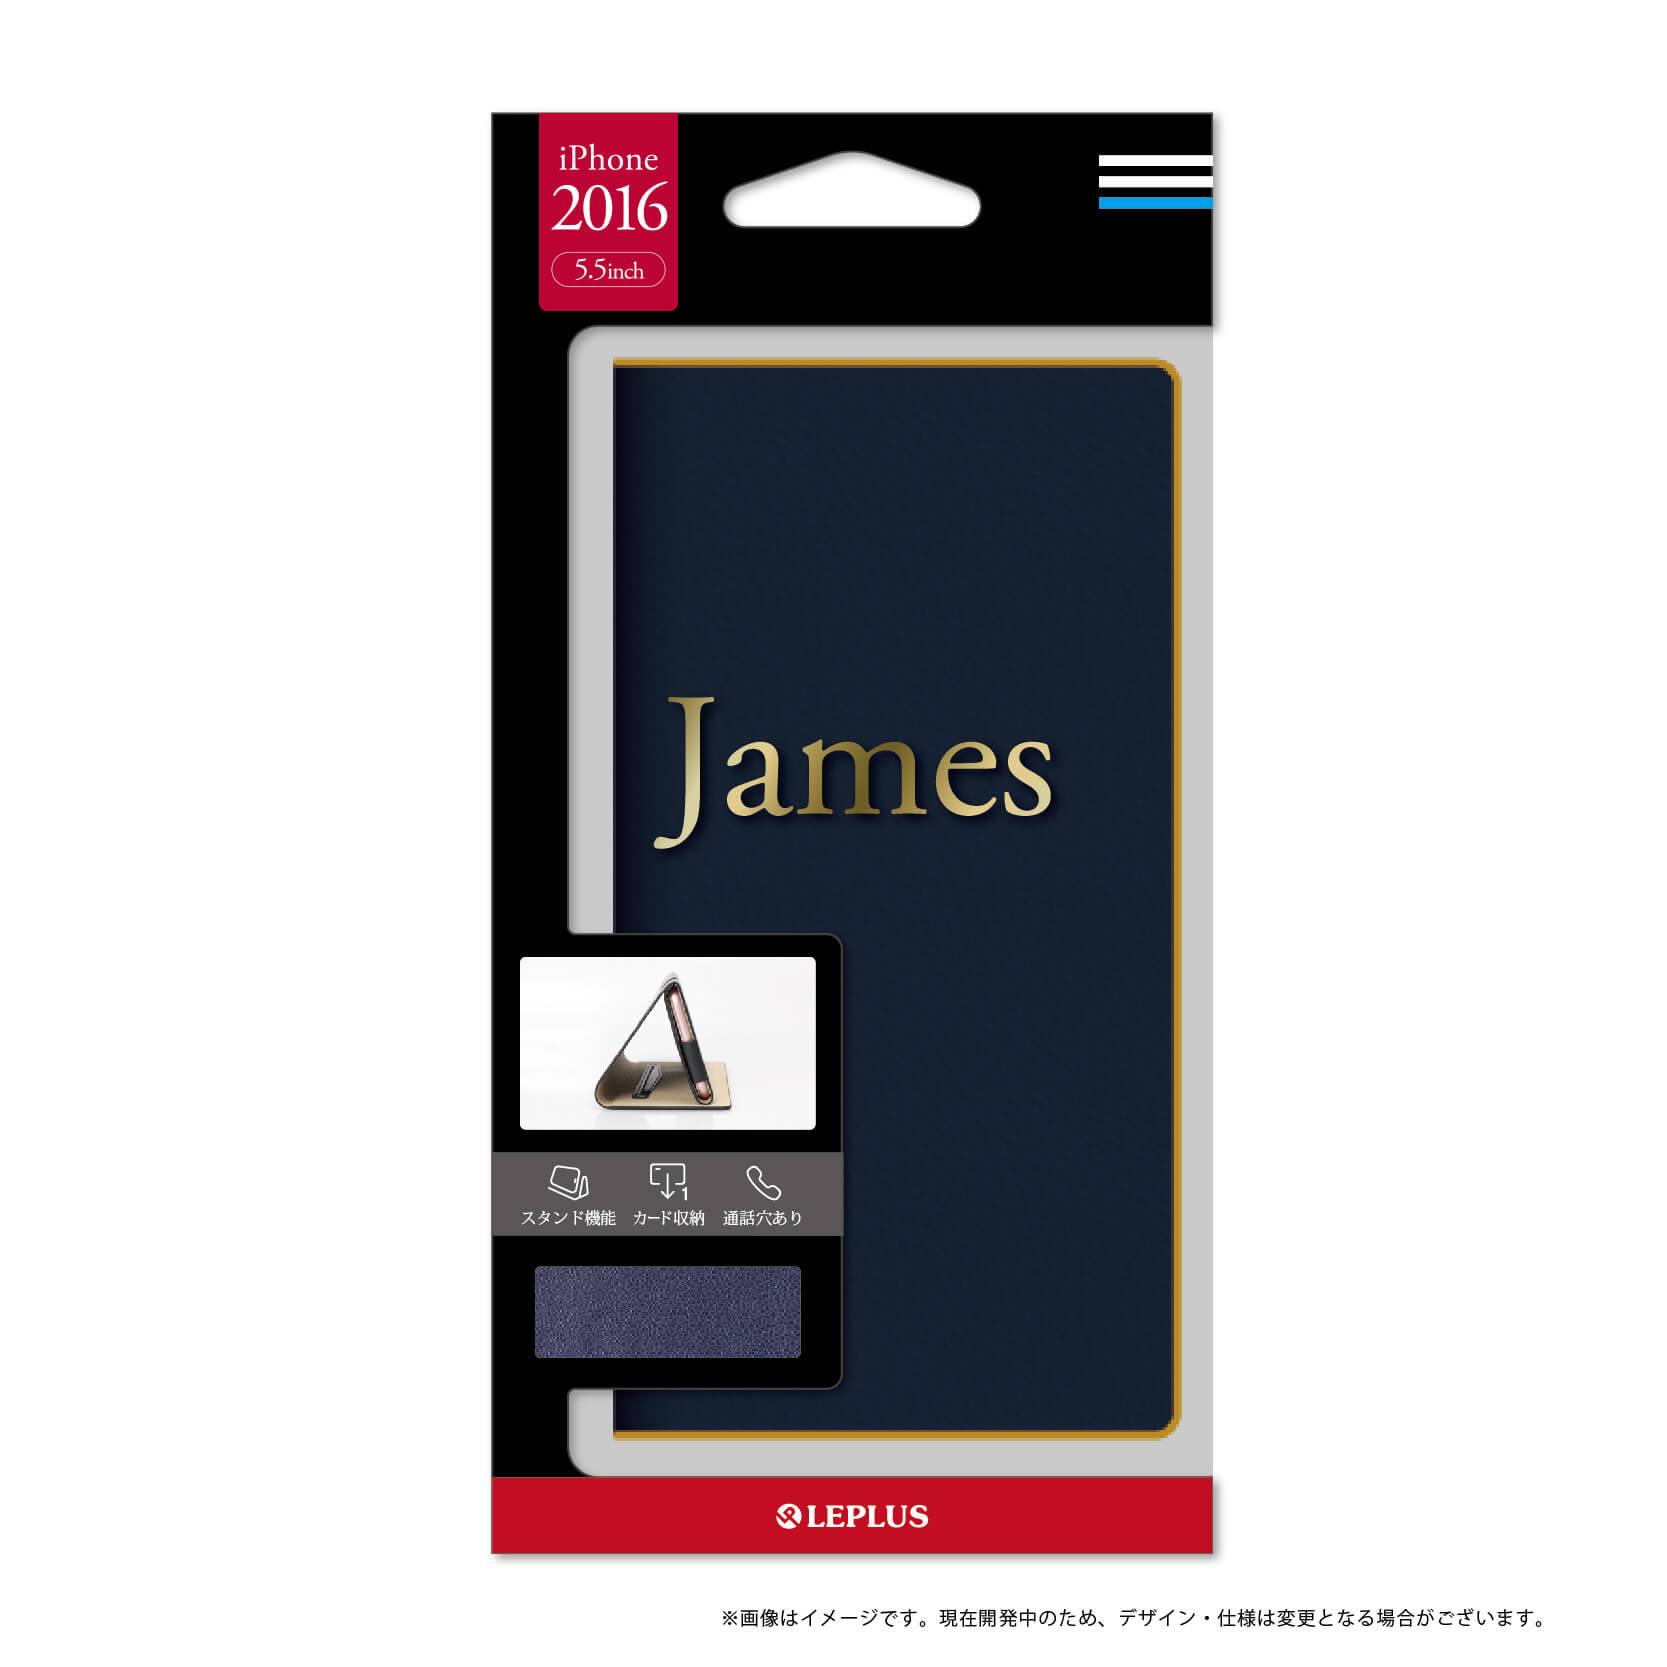 iPhone7 Plus 一枚革PUレザーケース「James」 ネイビー